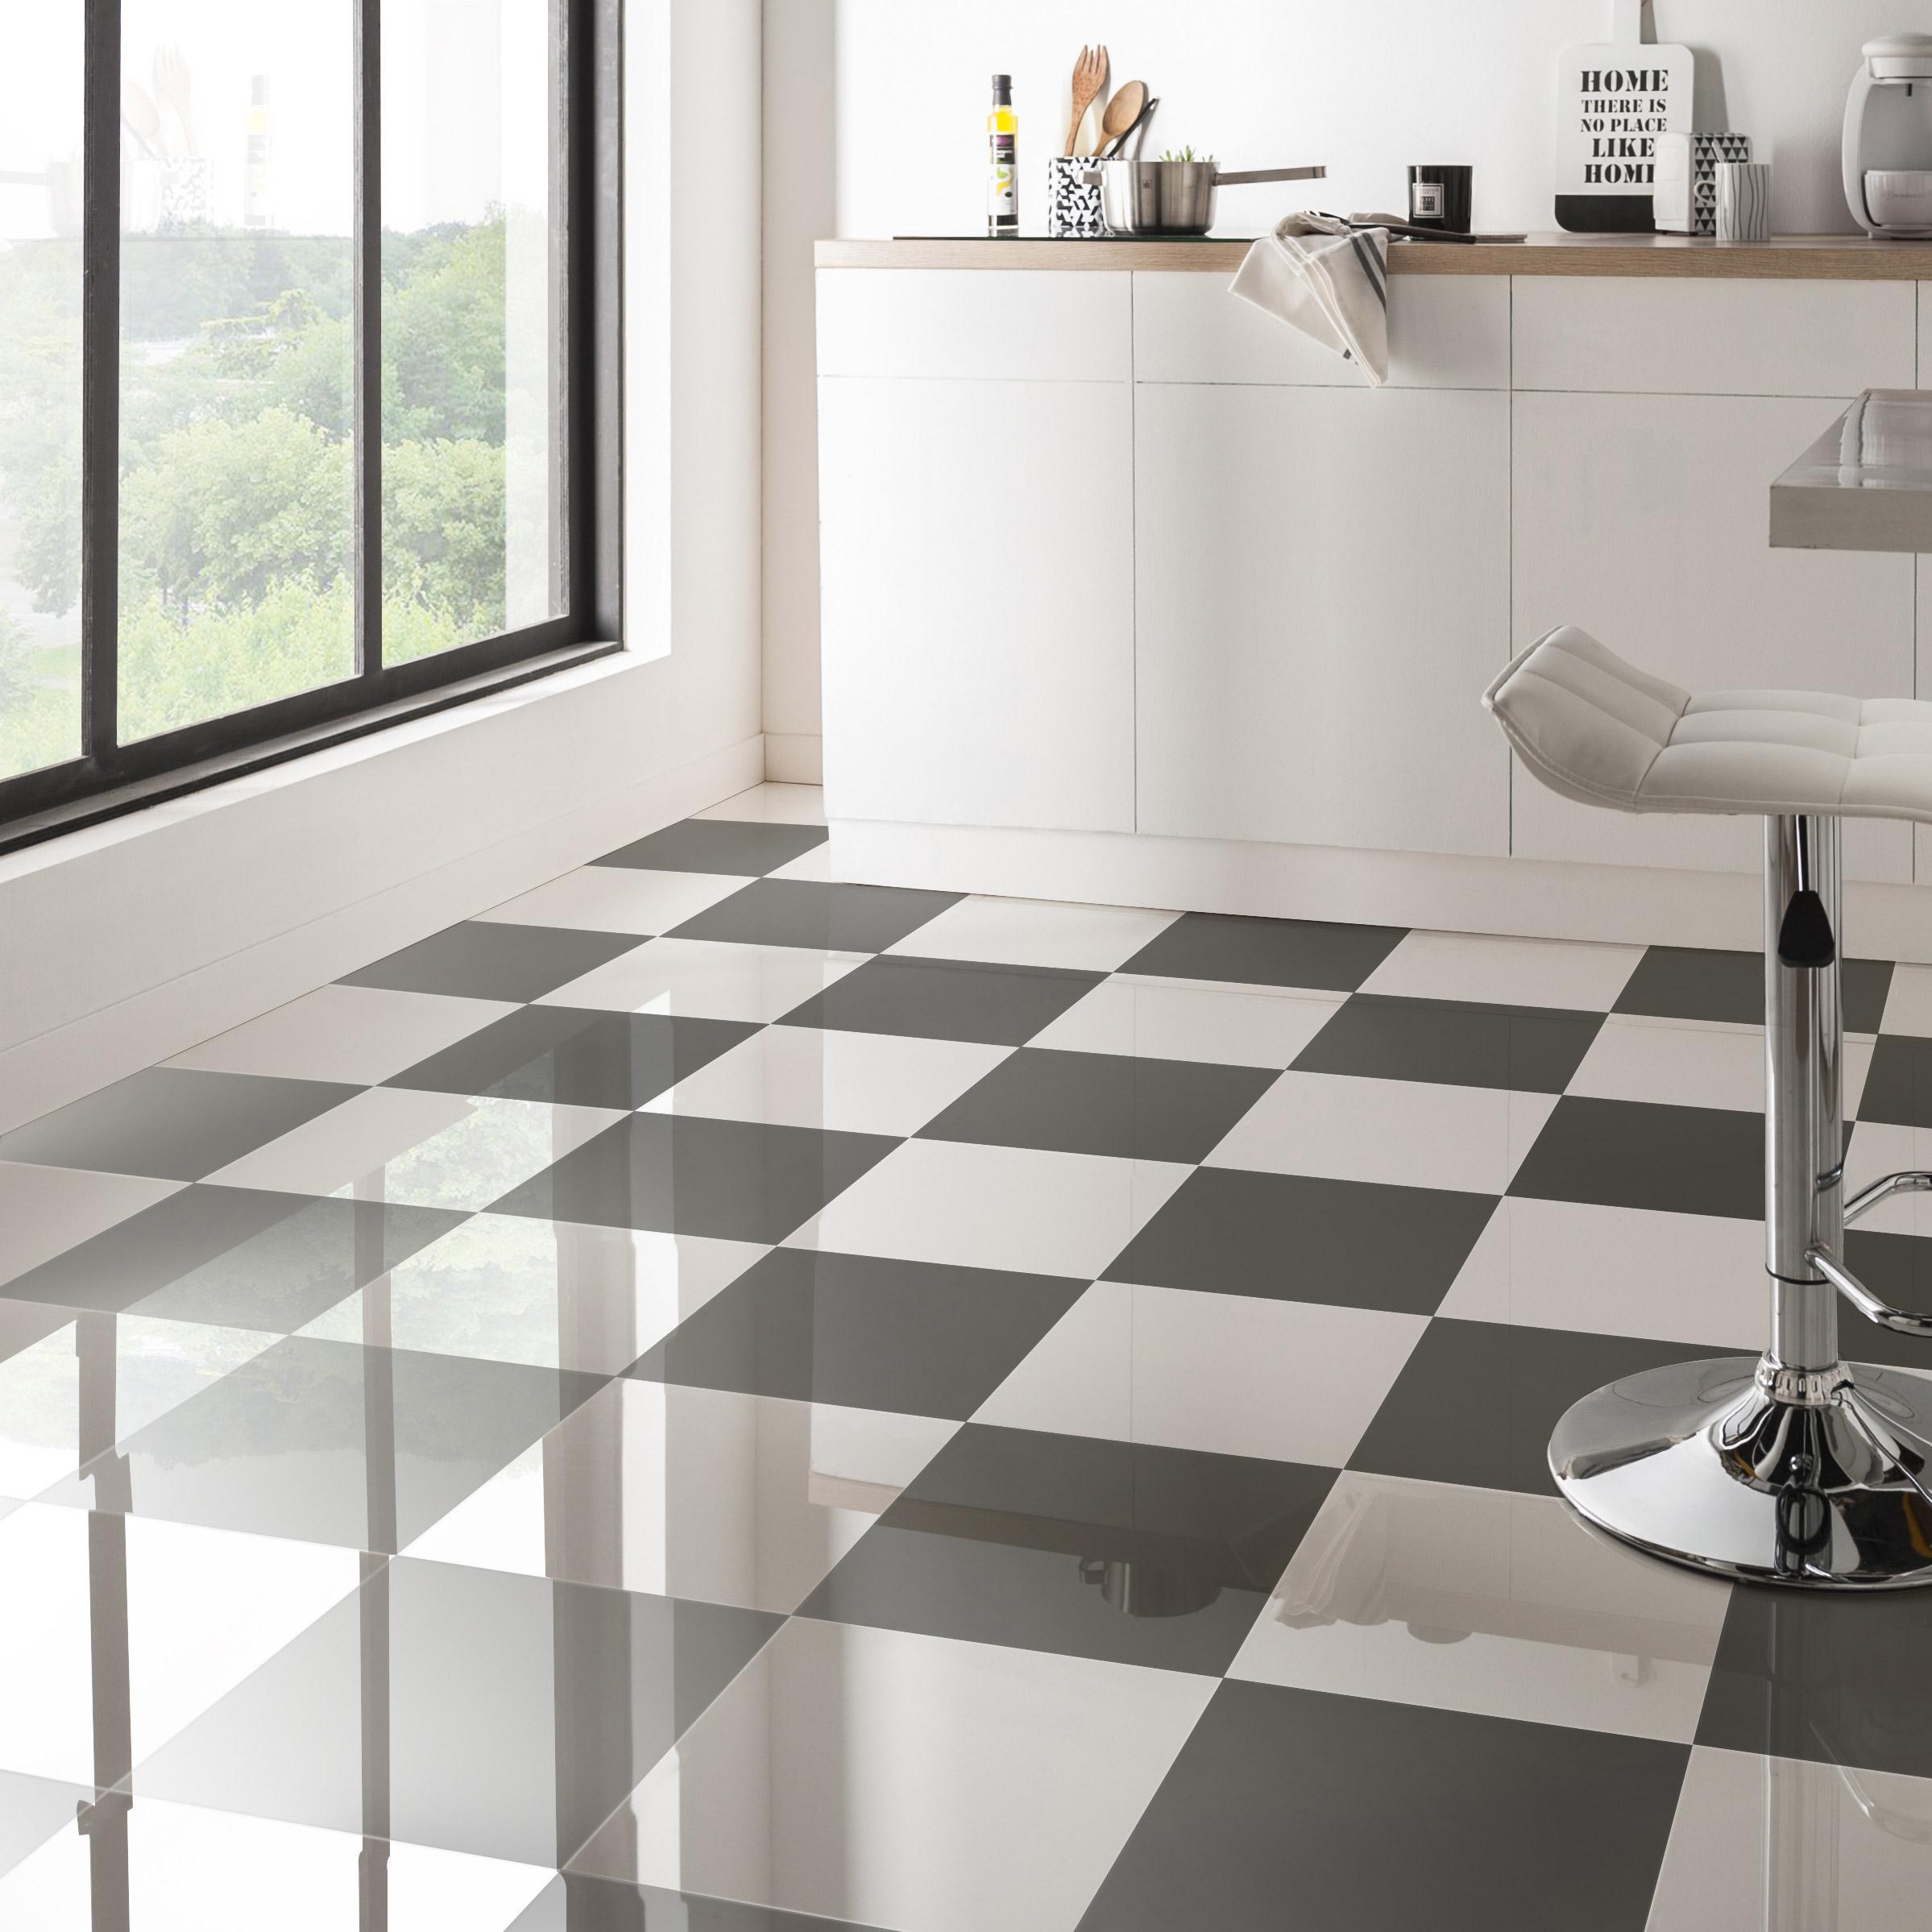 Carrelage Sol Et Mur Intenso Brillant Blanc L.30 X L.30 Cm ARTENS